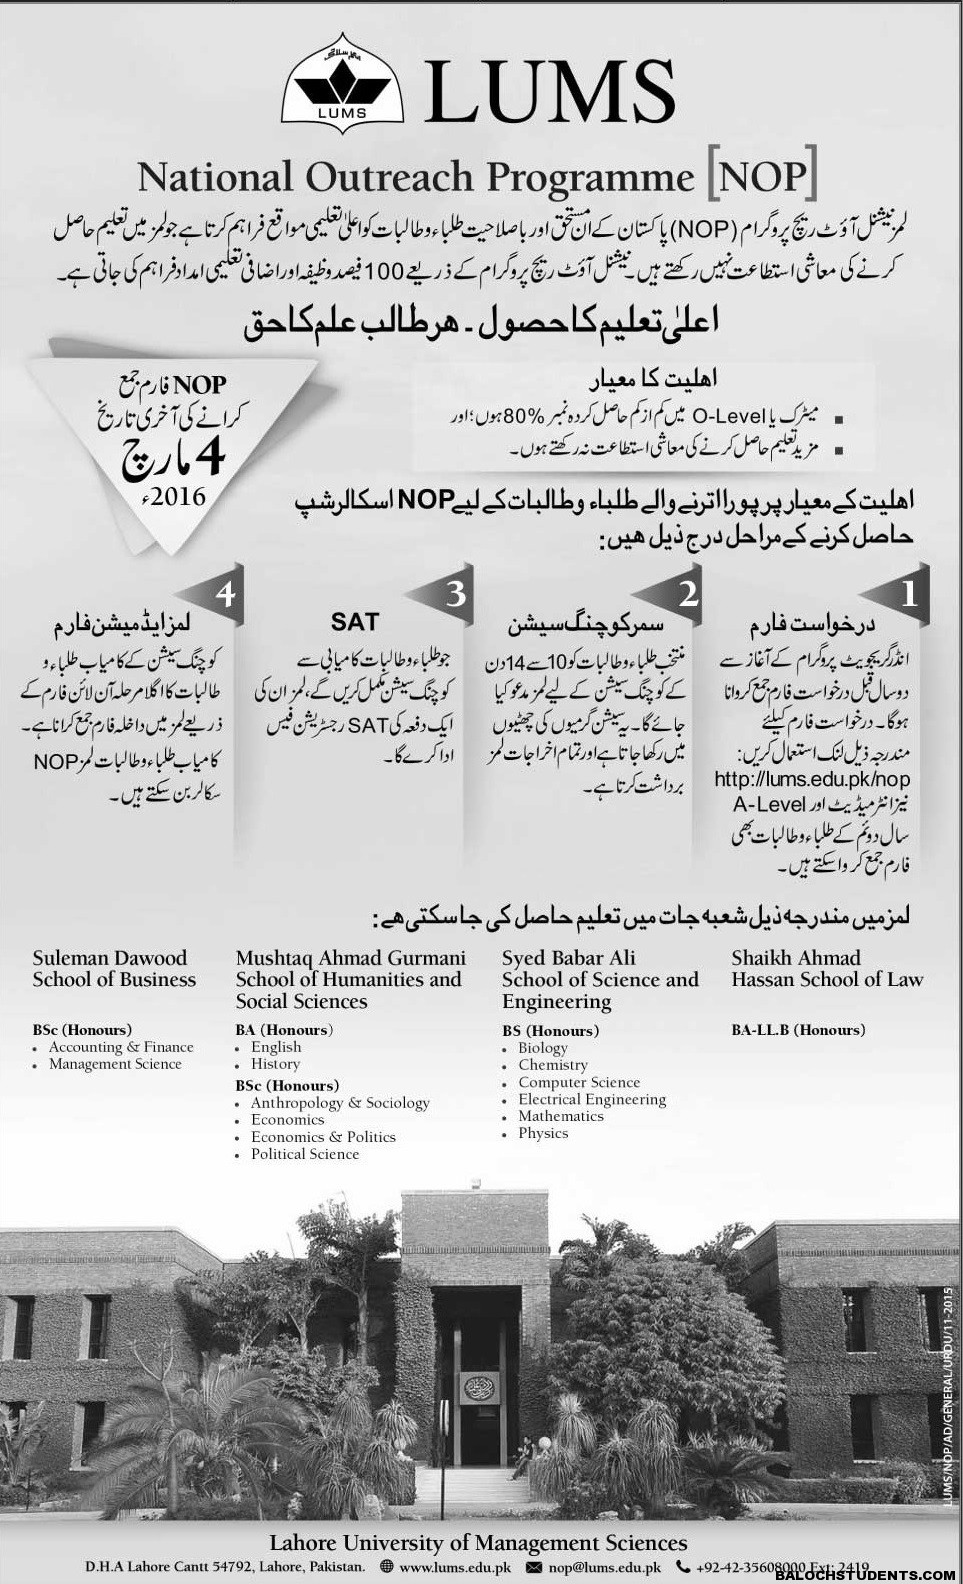 LUMS NOP (Scholarship Programme)